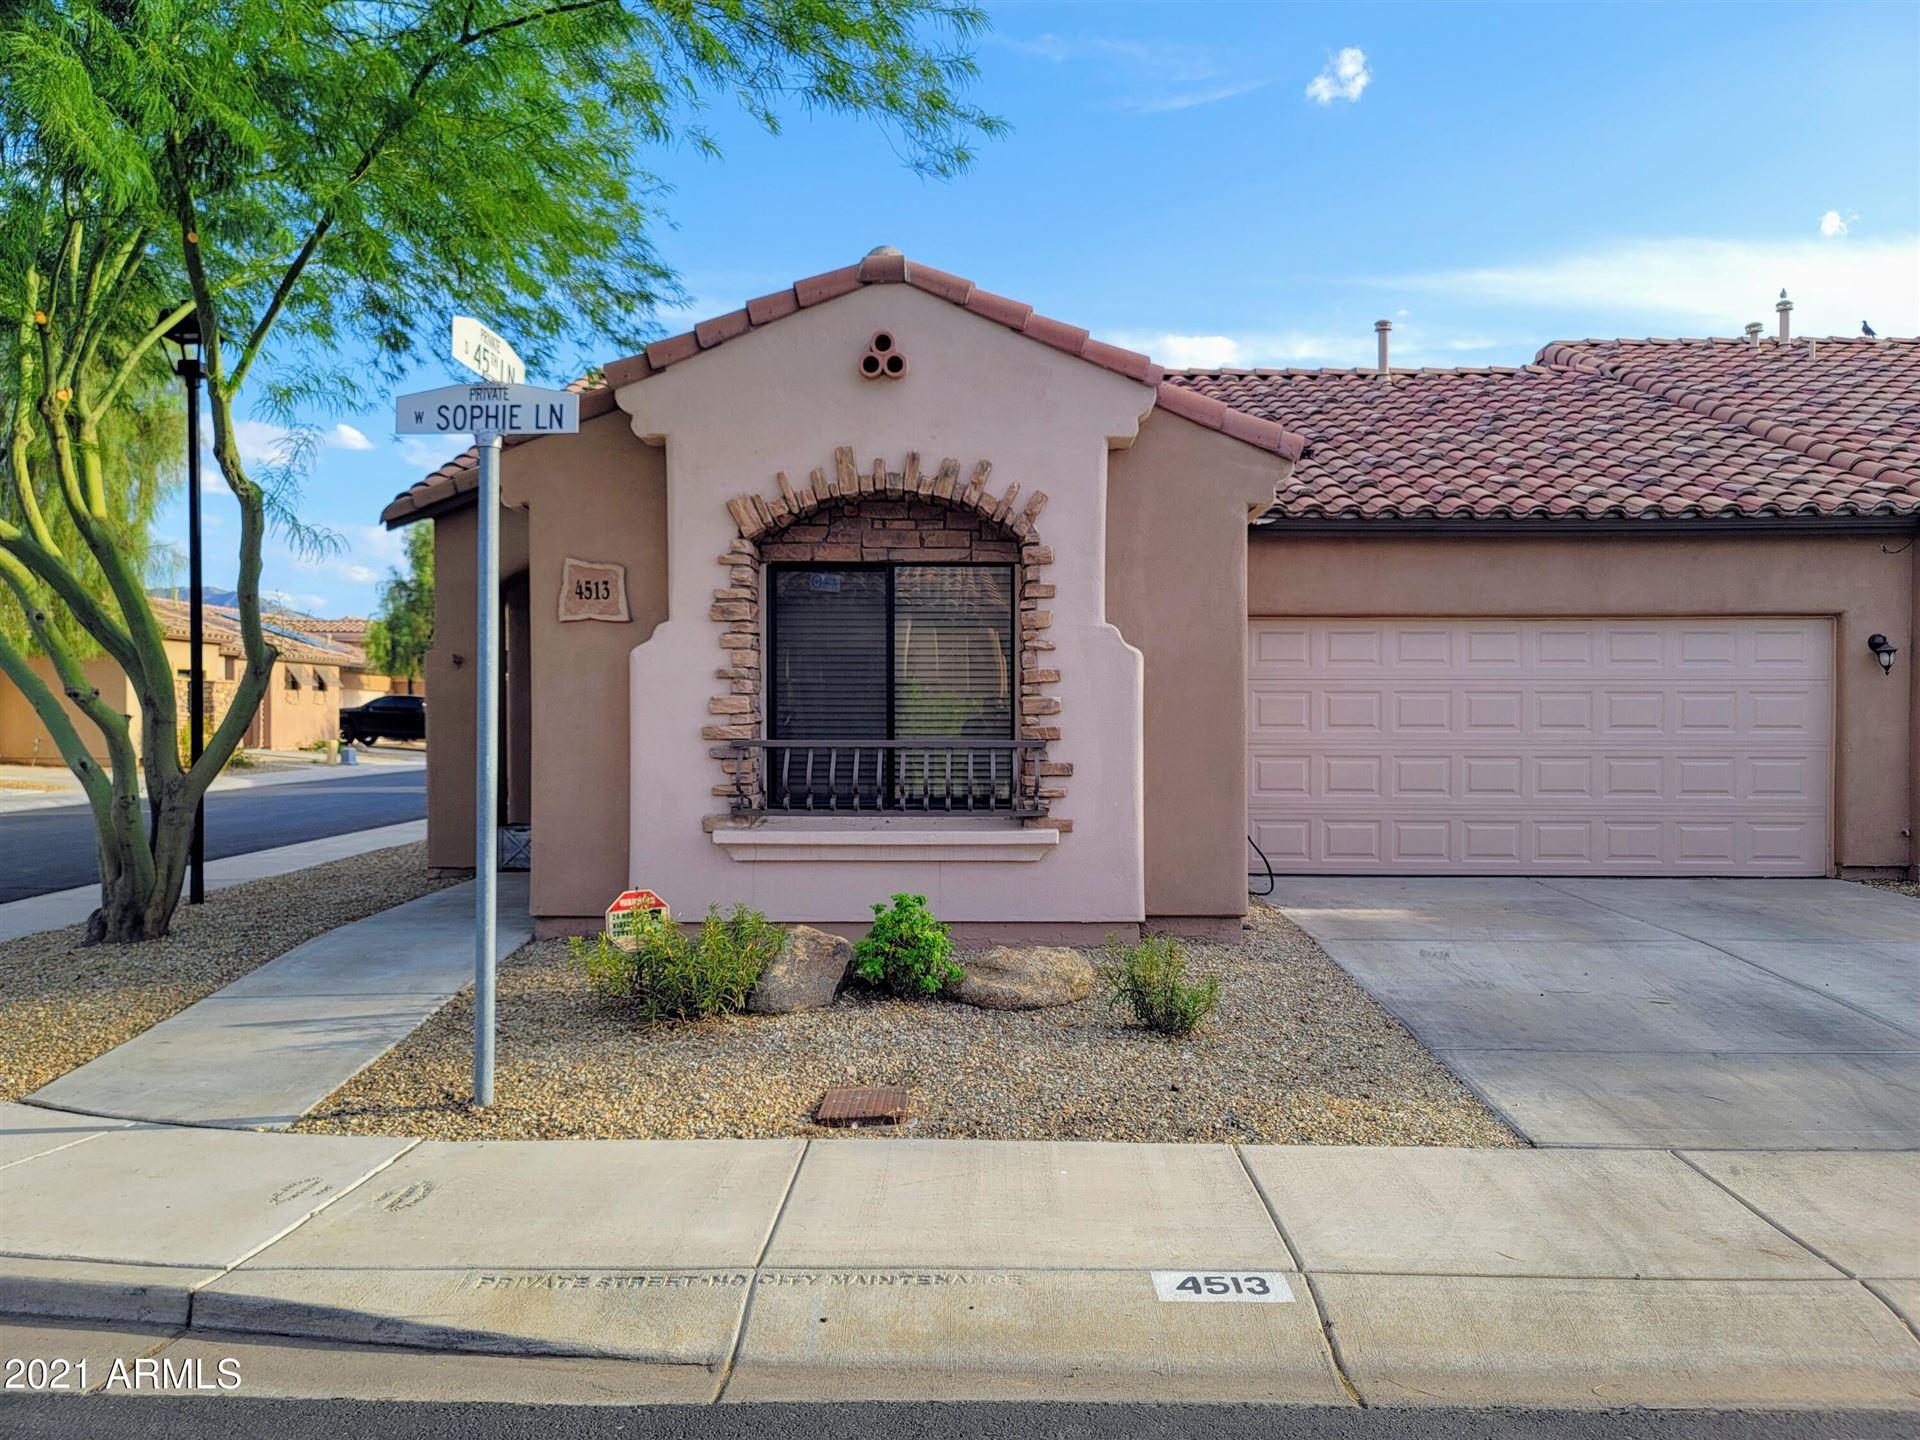 Photo of 4513 W SOPHIE Lane, Laveen, AZ 85339 (MLS # 6292571)